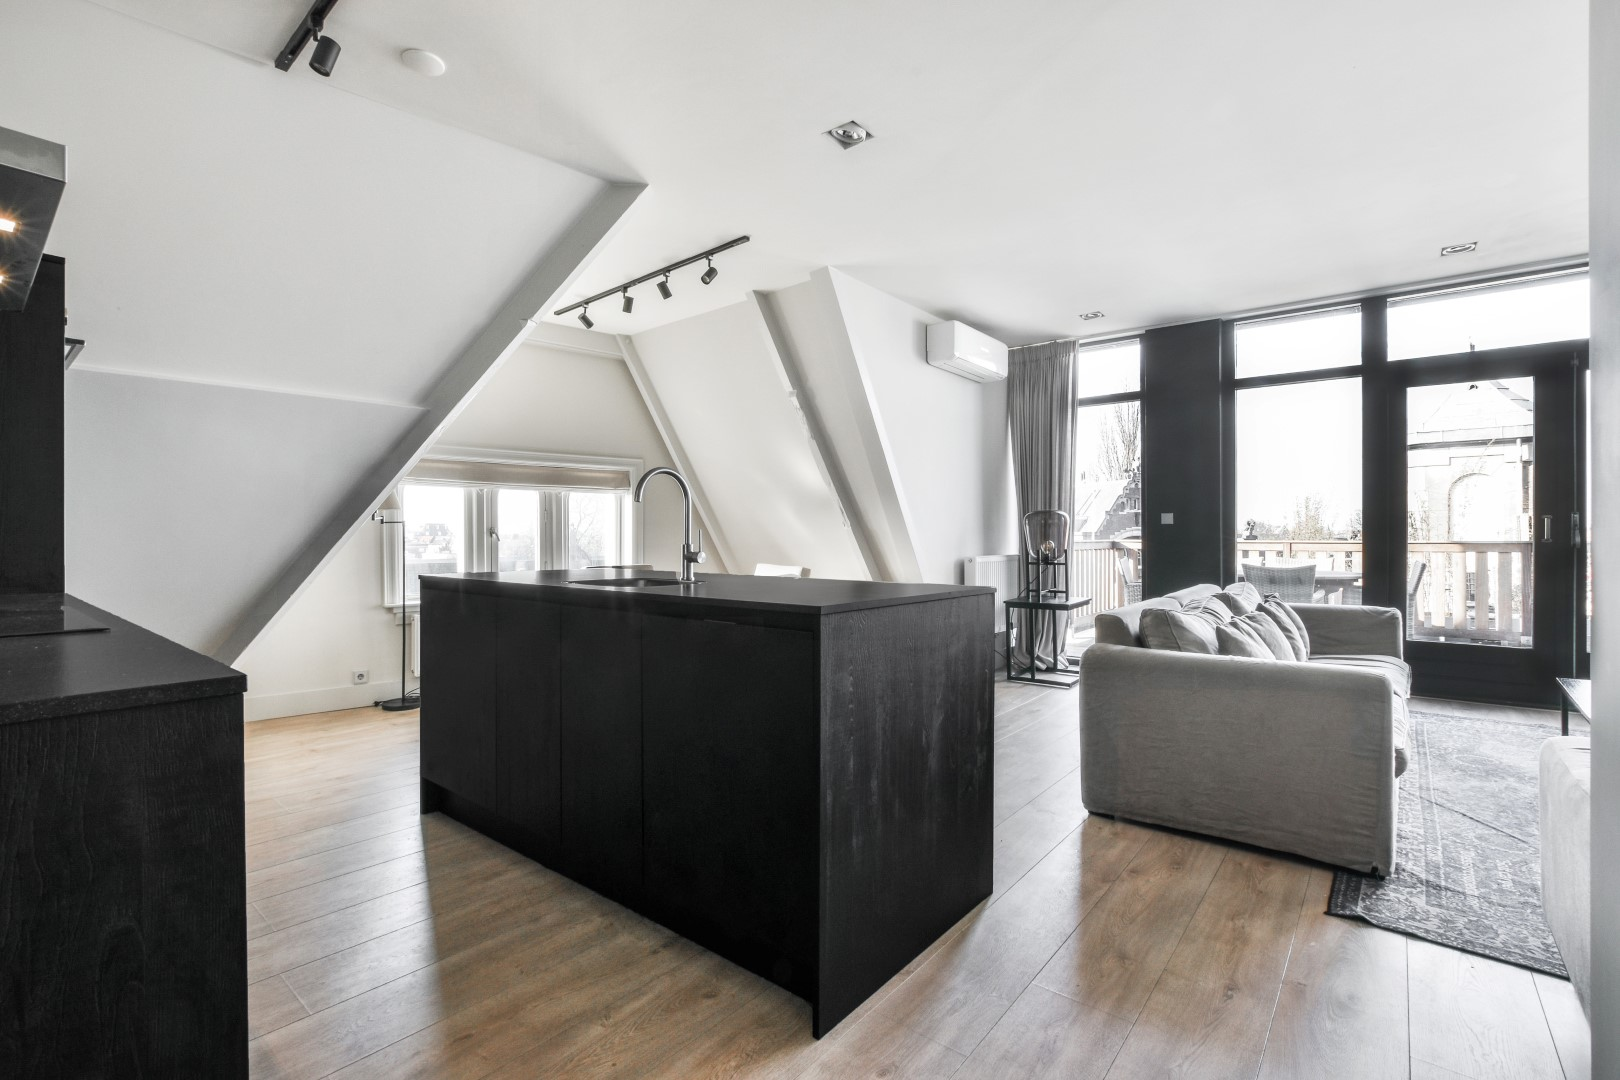 Herengracht 184 B 1016 BS, Amsterdam, Noord-Holland Netherlands, 2 Slaapkamers Slaapkamers, ,1 BadkamerBadkamers,Appartement,Huur,Herengracht,5,1340